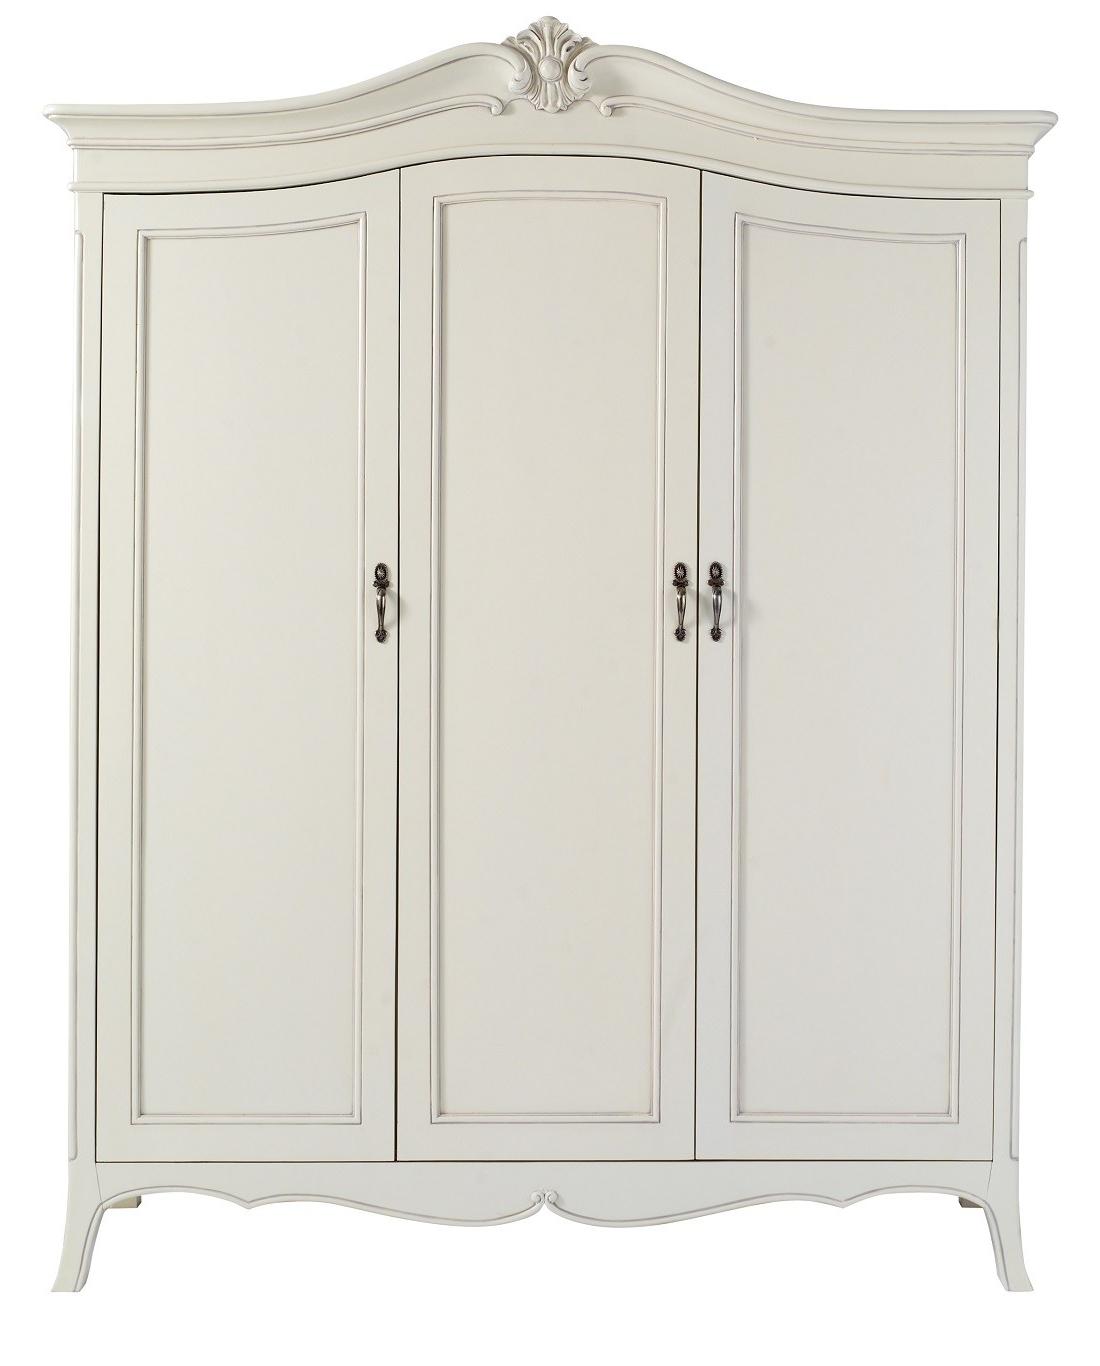 2018 Triple Door Wardrobes For Louis French Ivory Painted 3 Door Triple Wardrobe (View 15 of 15)